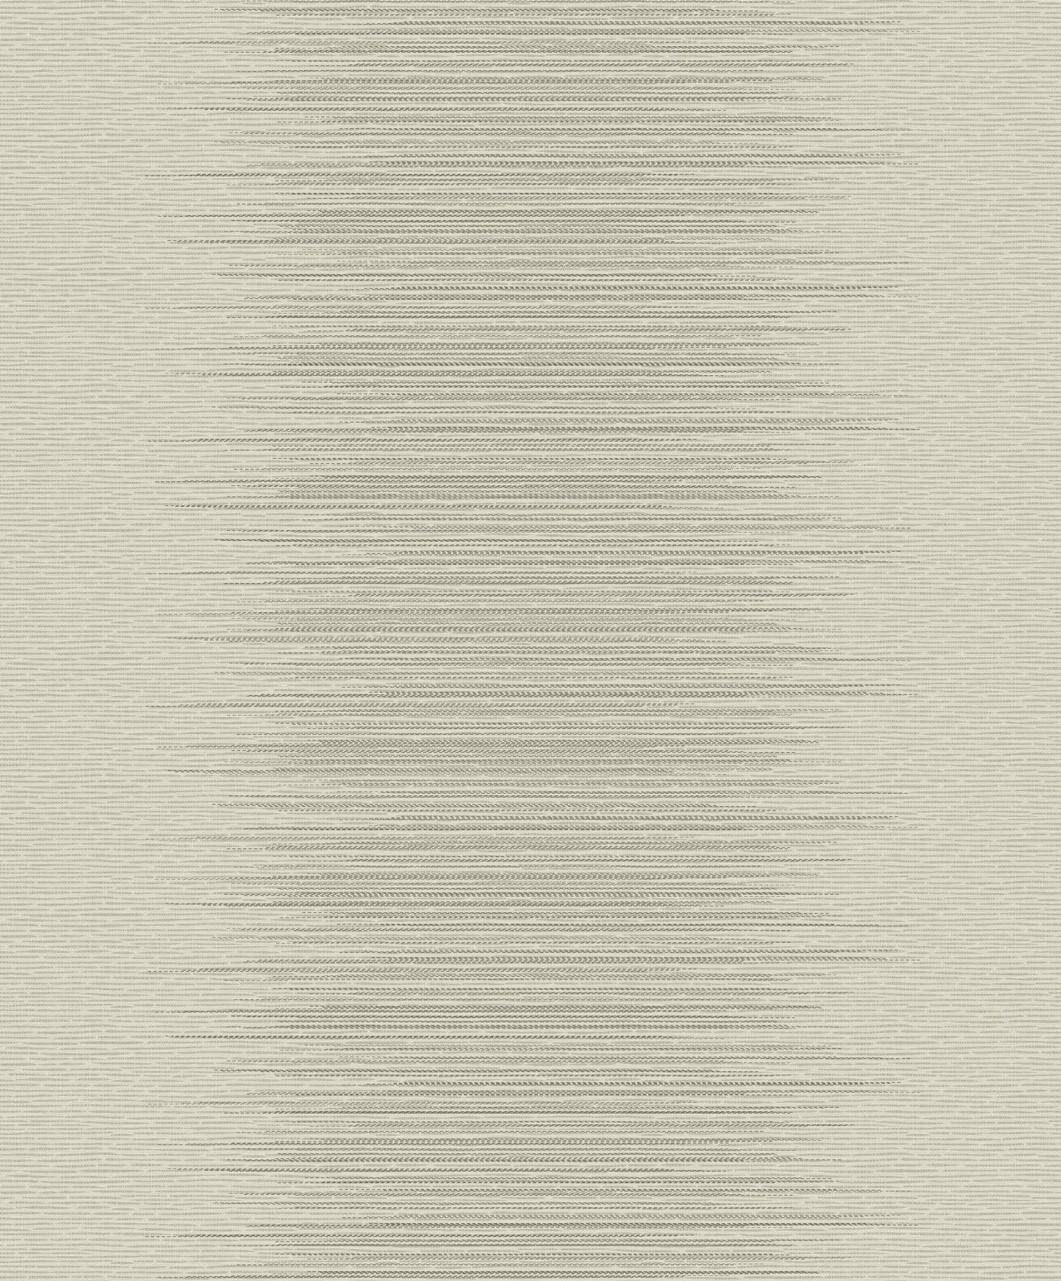 Tapety na zeď Vavex A10002 | 0,53 x 10,05 m (Vliesová tapeta - béžová)